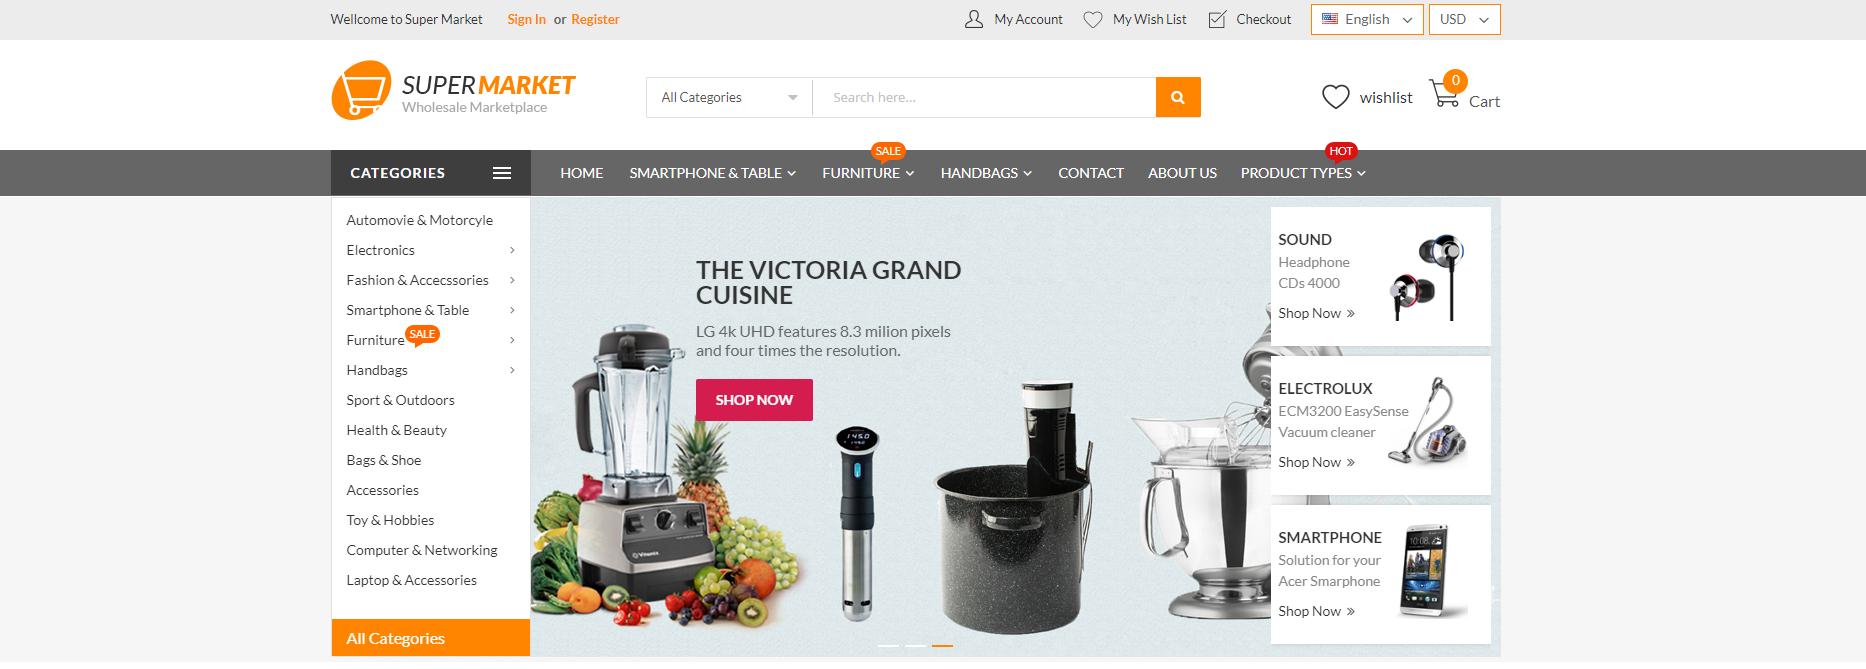 Supermarket theme homepage